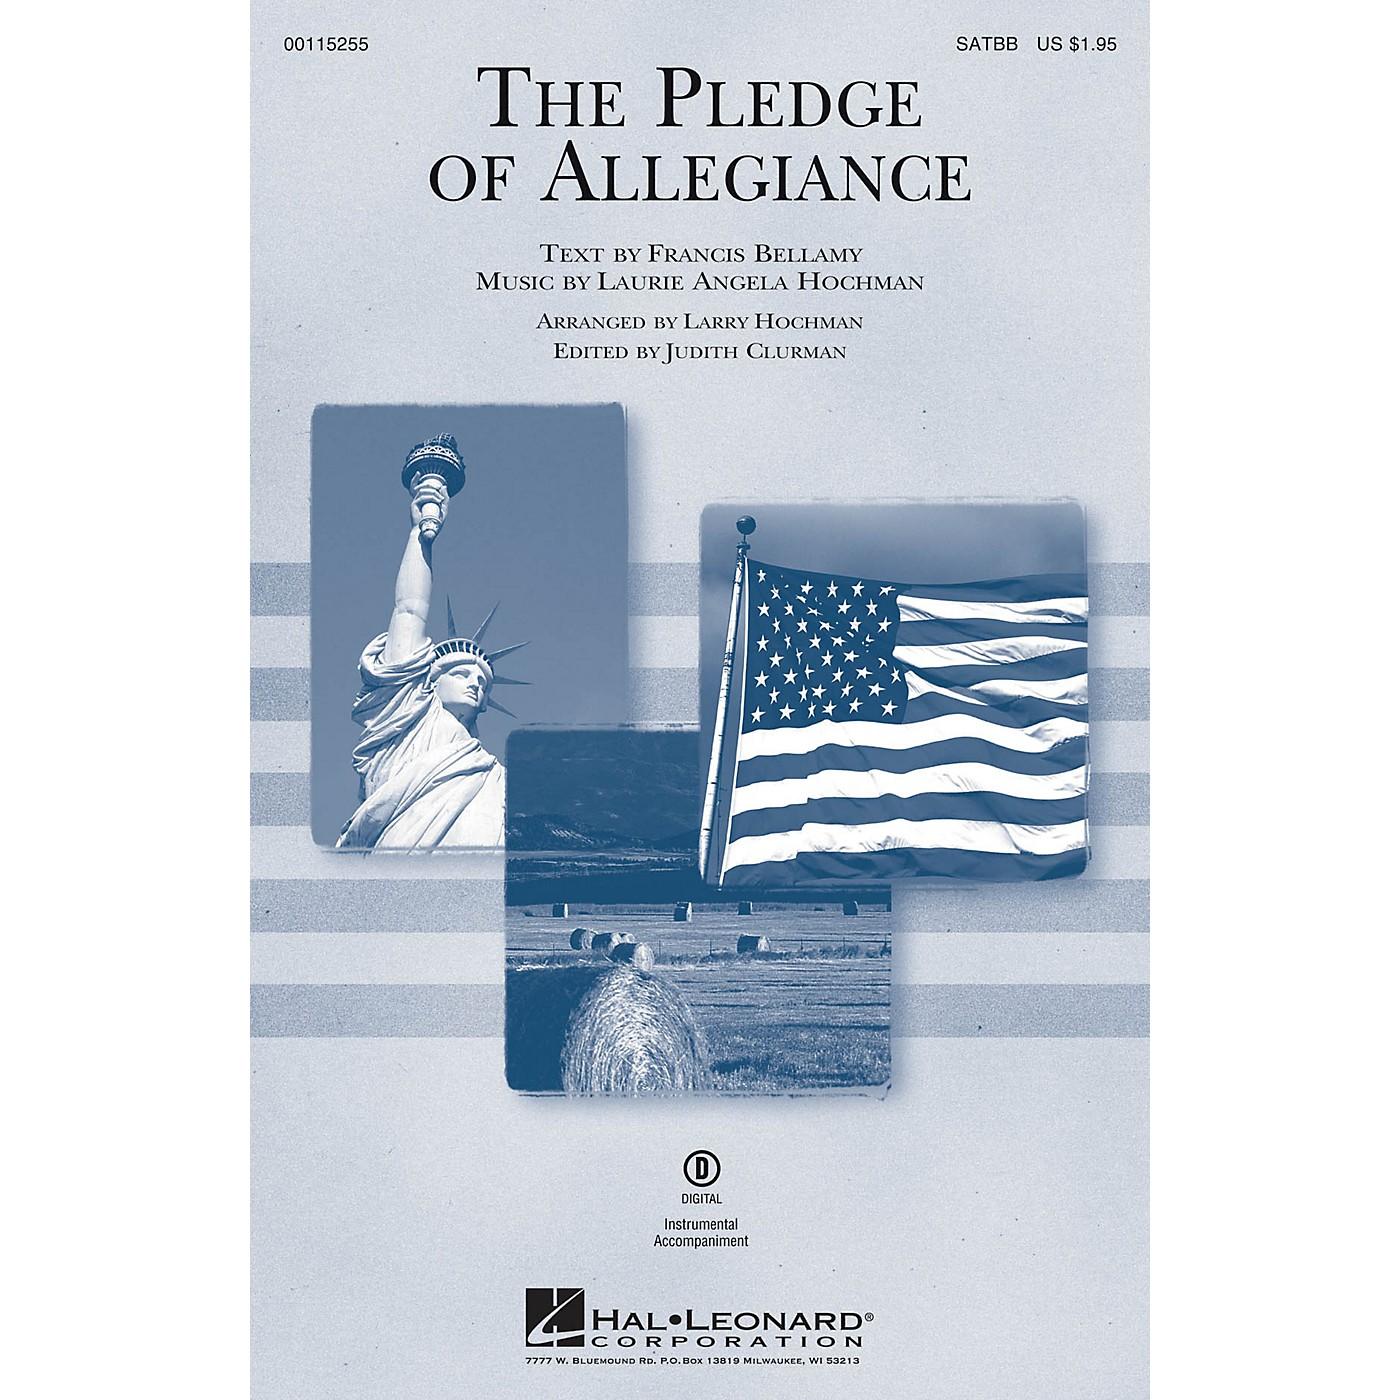 Edward B. Marks Music Company The Pledge of Allegiance SATBB arranged by Larry Hochman thumbnail